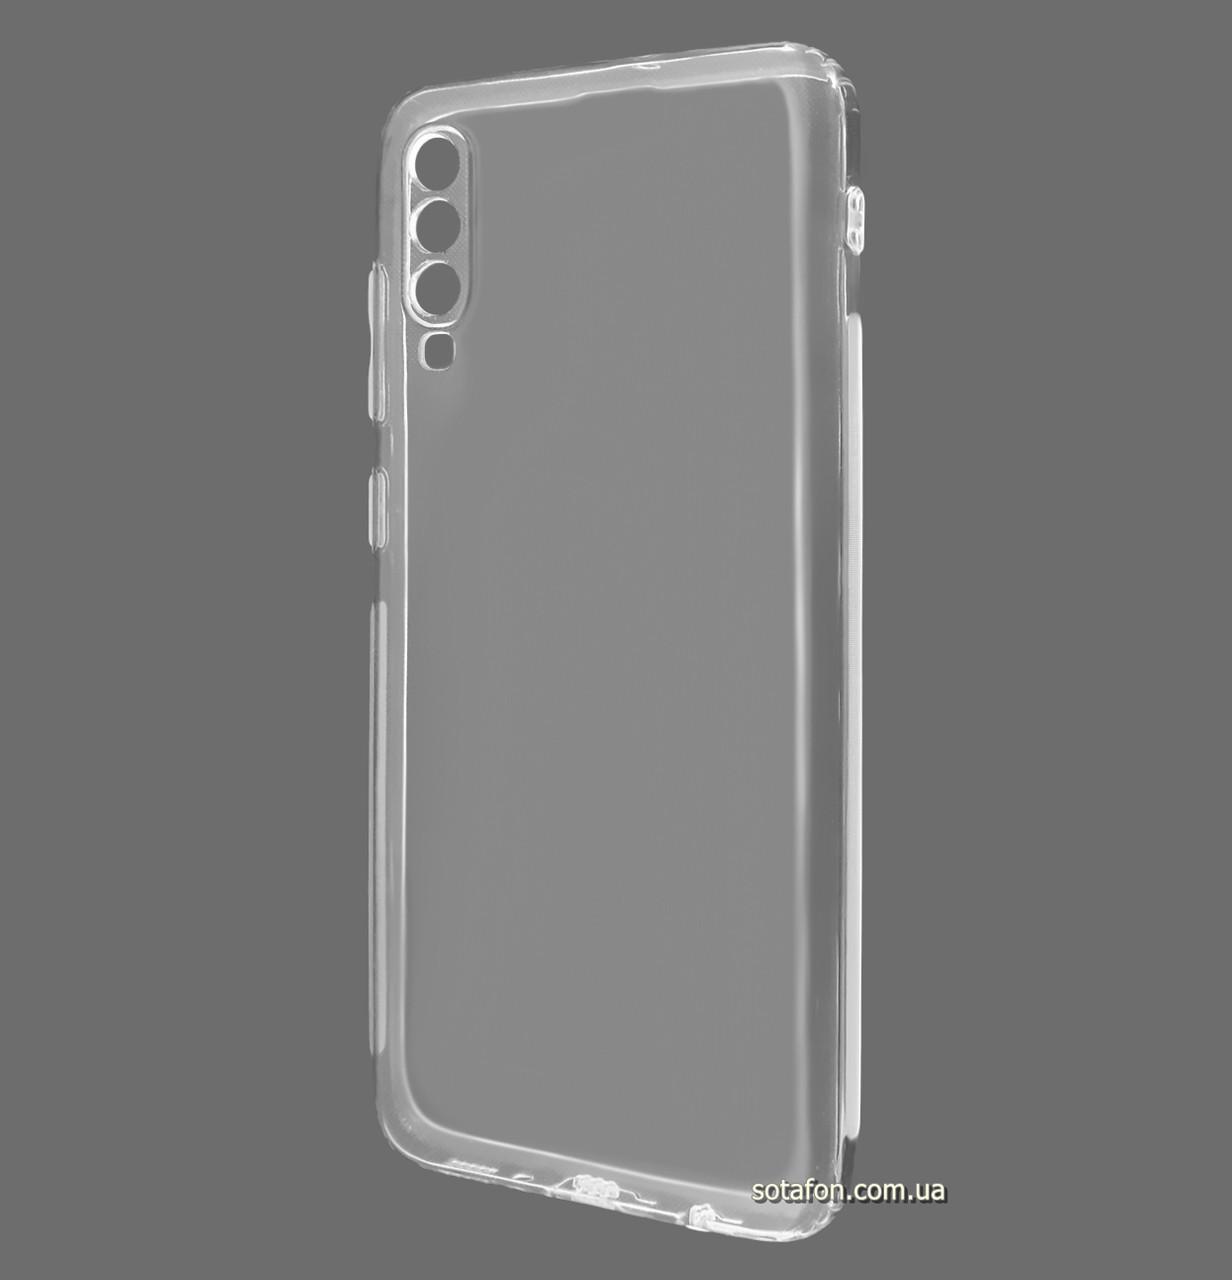 Силиконовый чехол KST Ultra-thin на Samsung Galaxy A30s SM-A307F Clean Grid Transparent